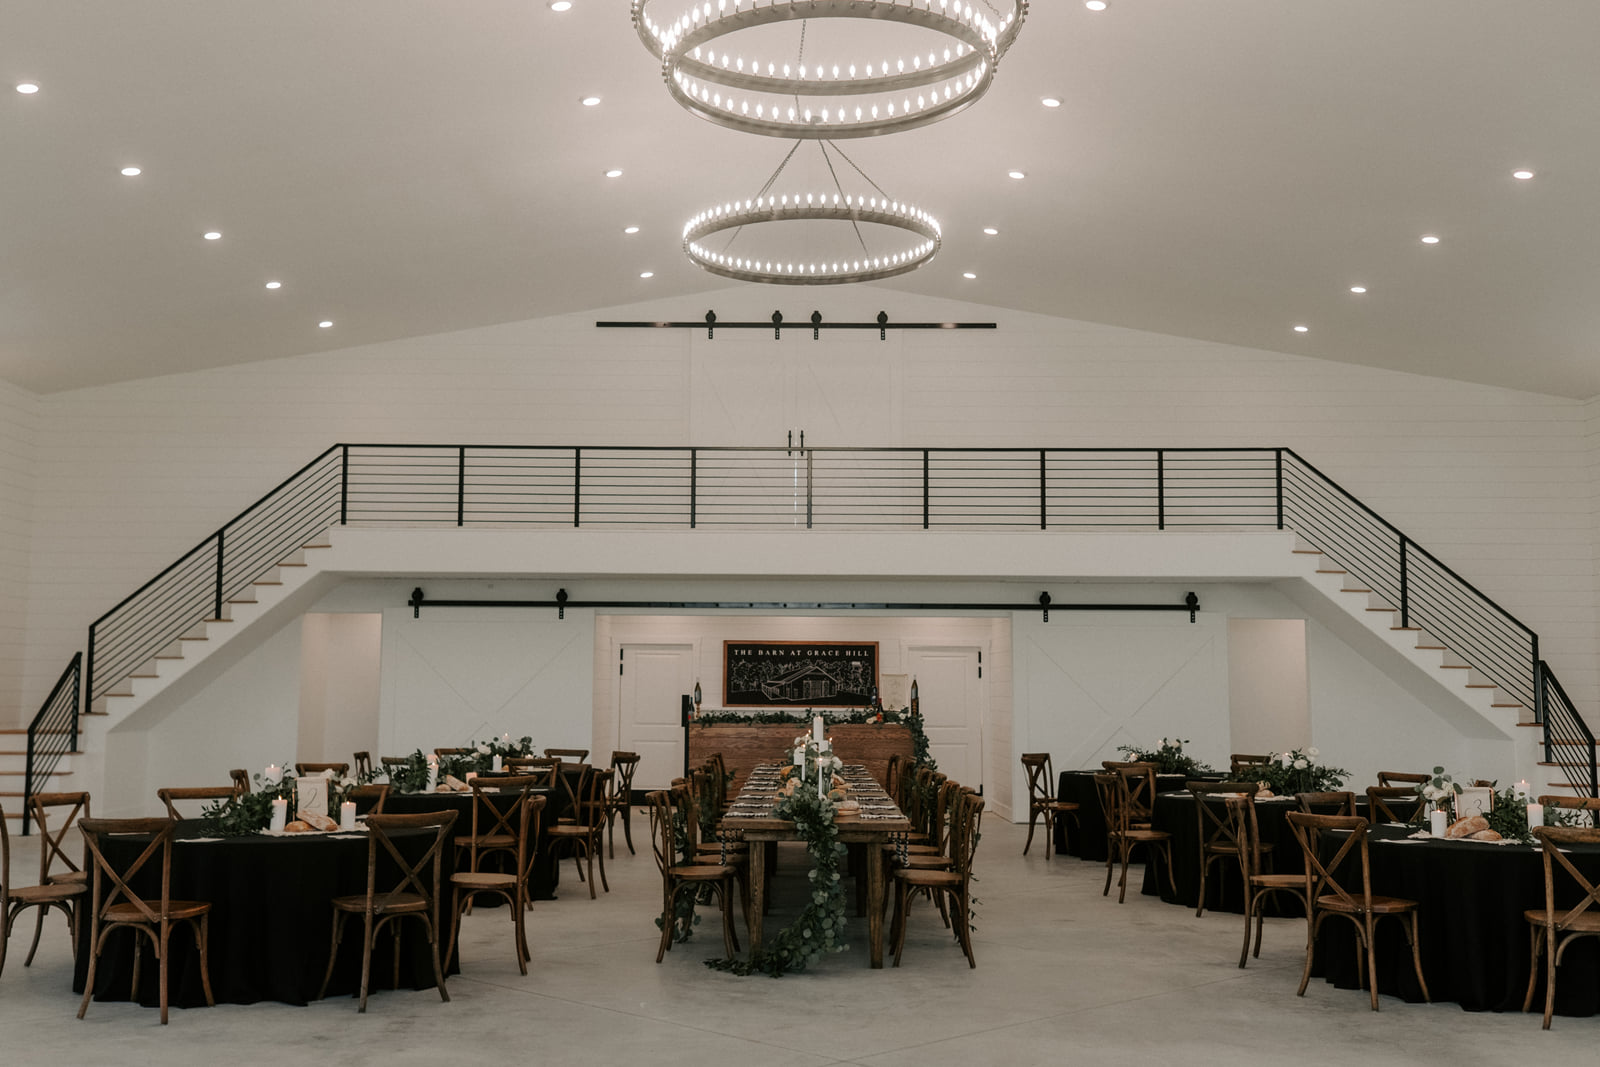 The-Barn-at-Grace-Hill-Wichita-Wedding-Venue-338.jpg